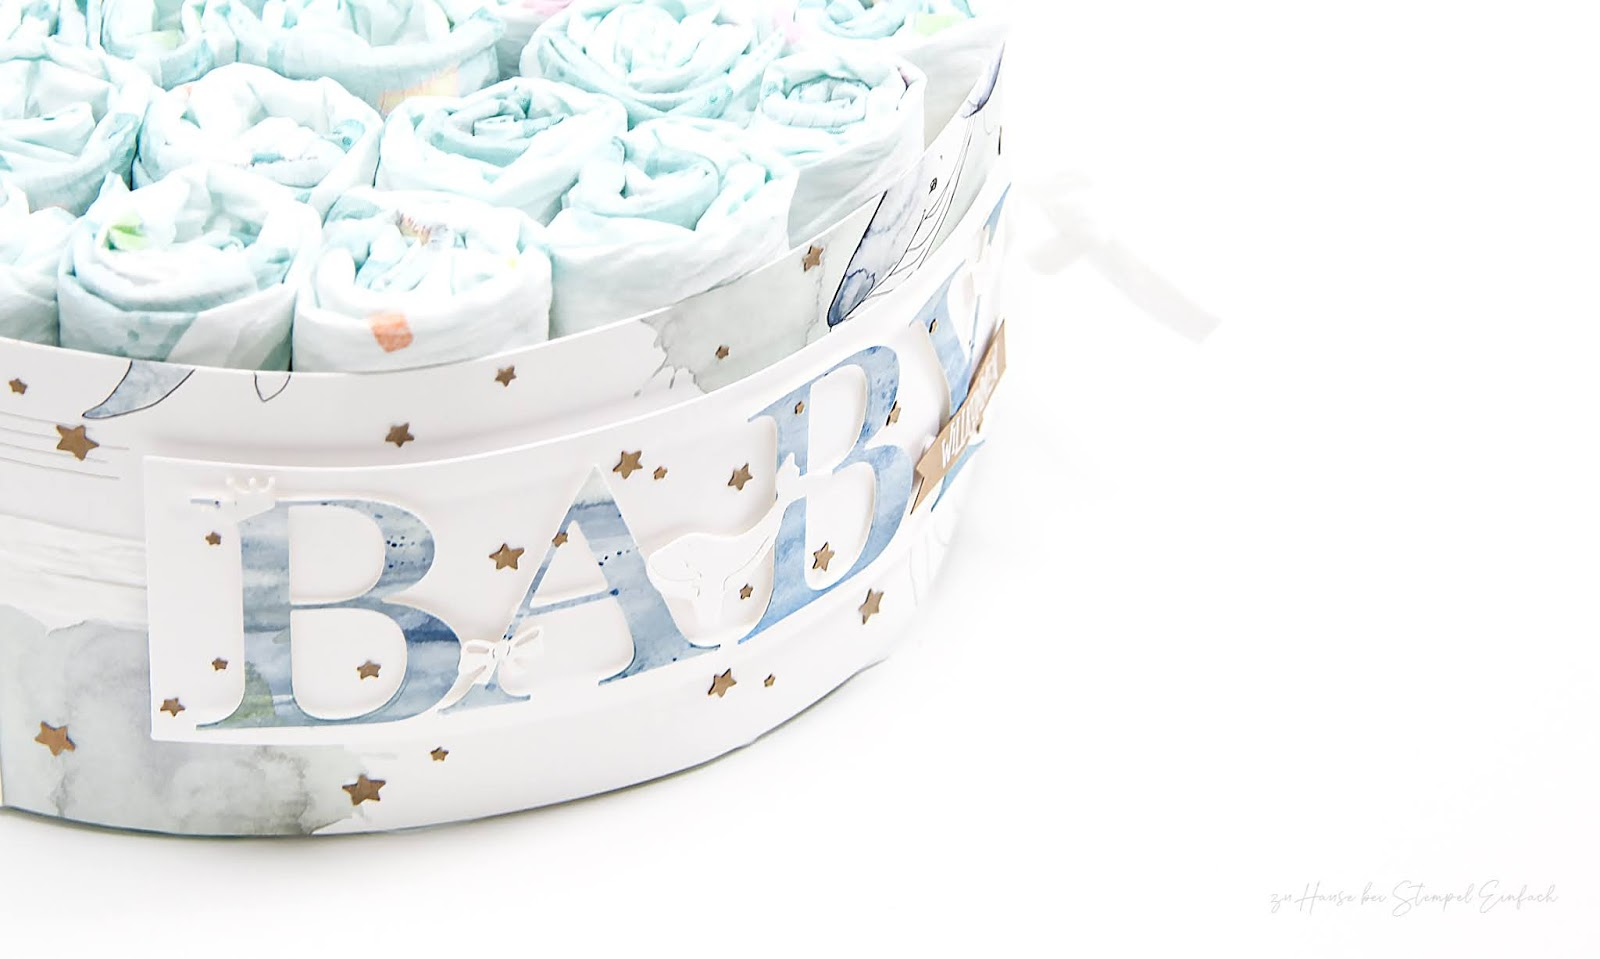 babygeschnke-windeltorte